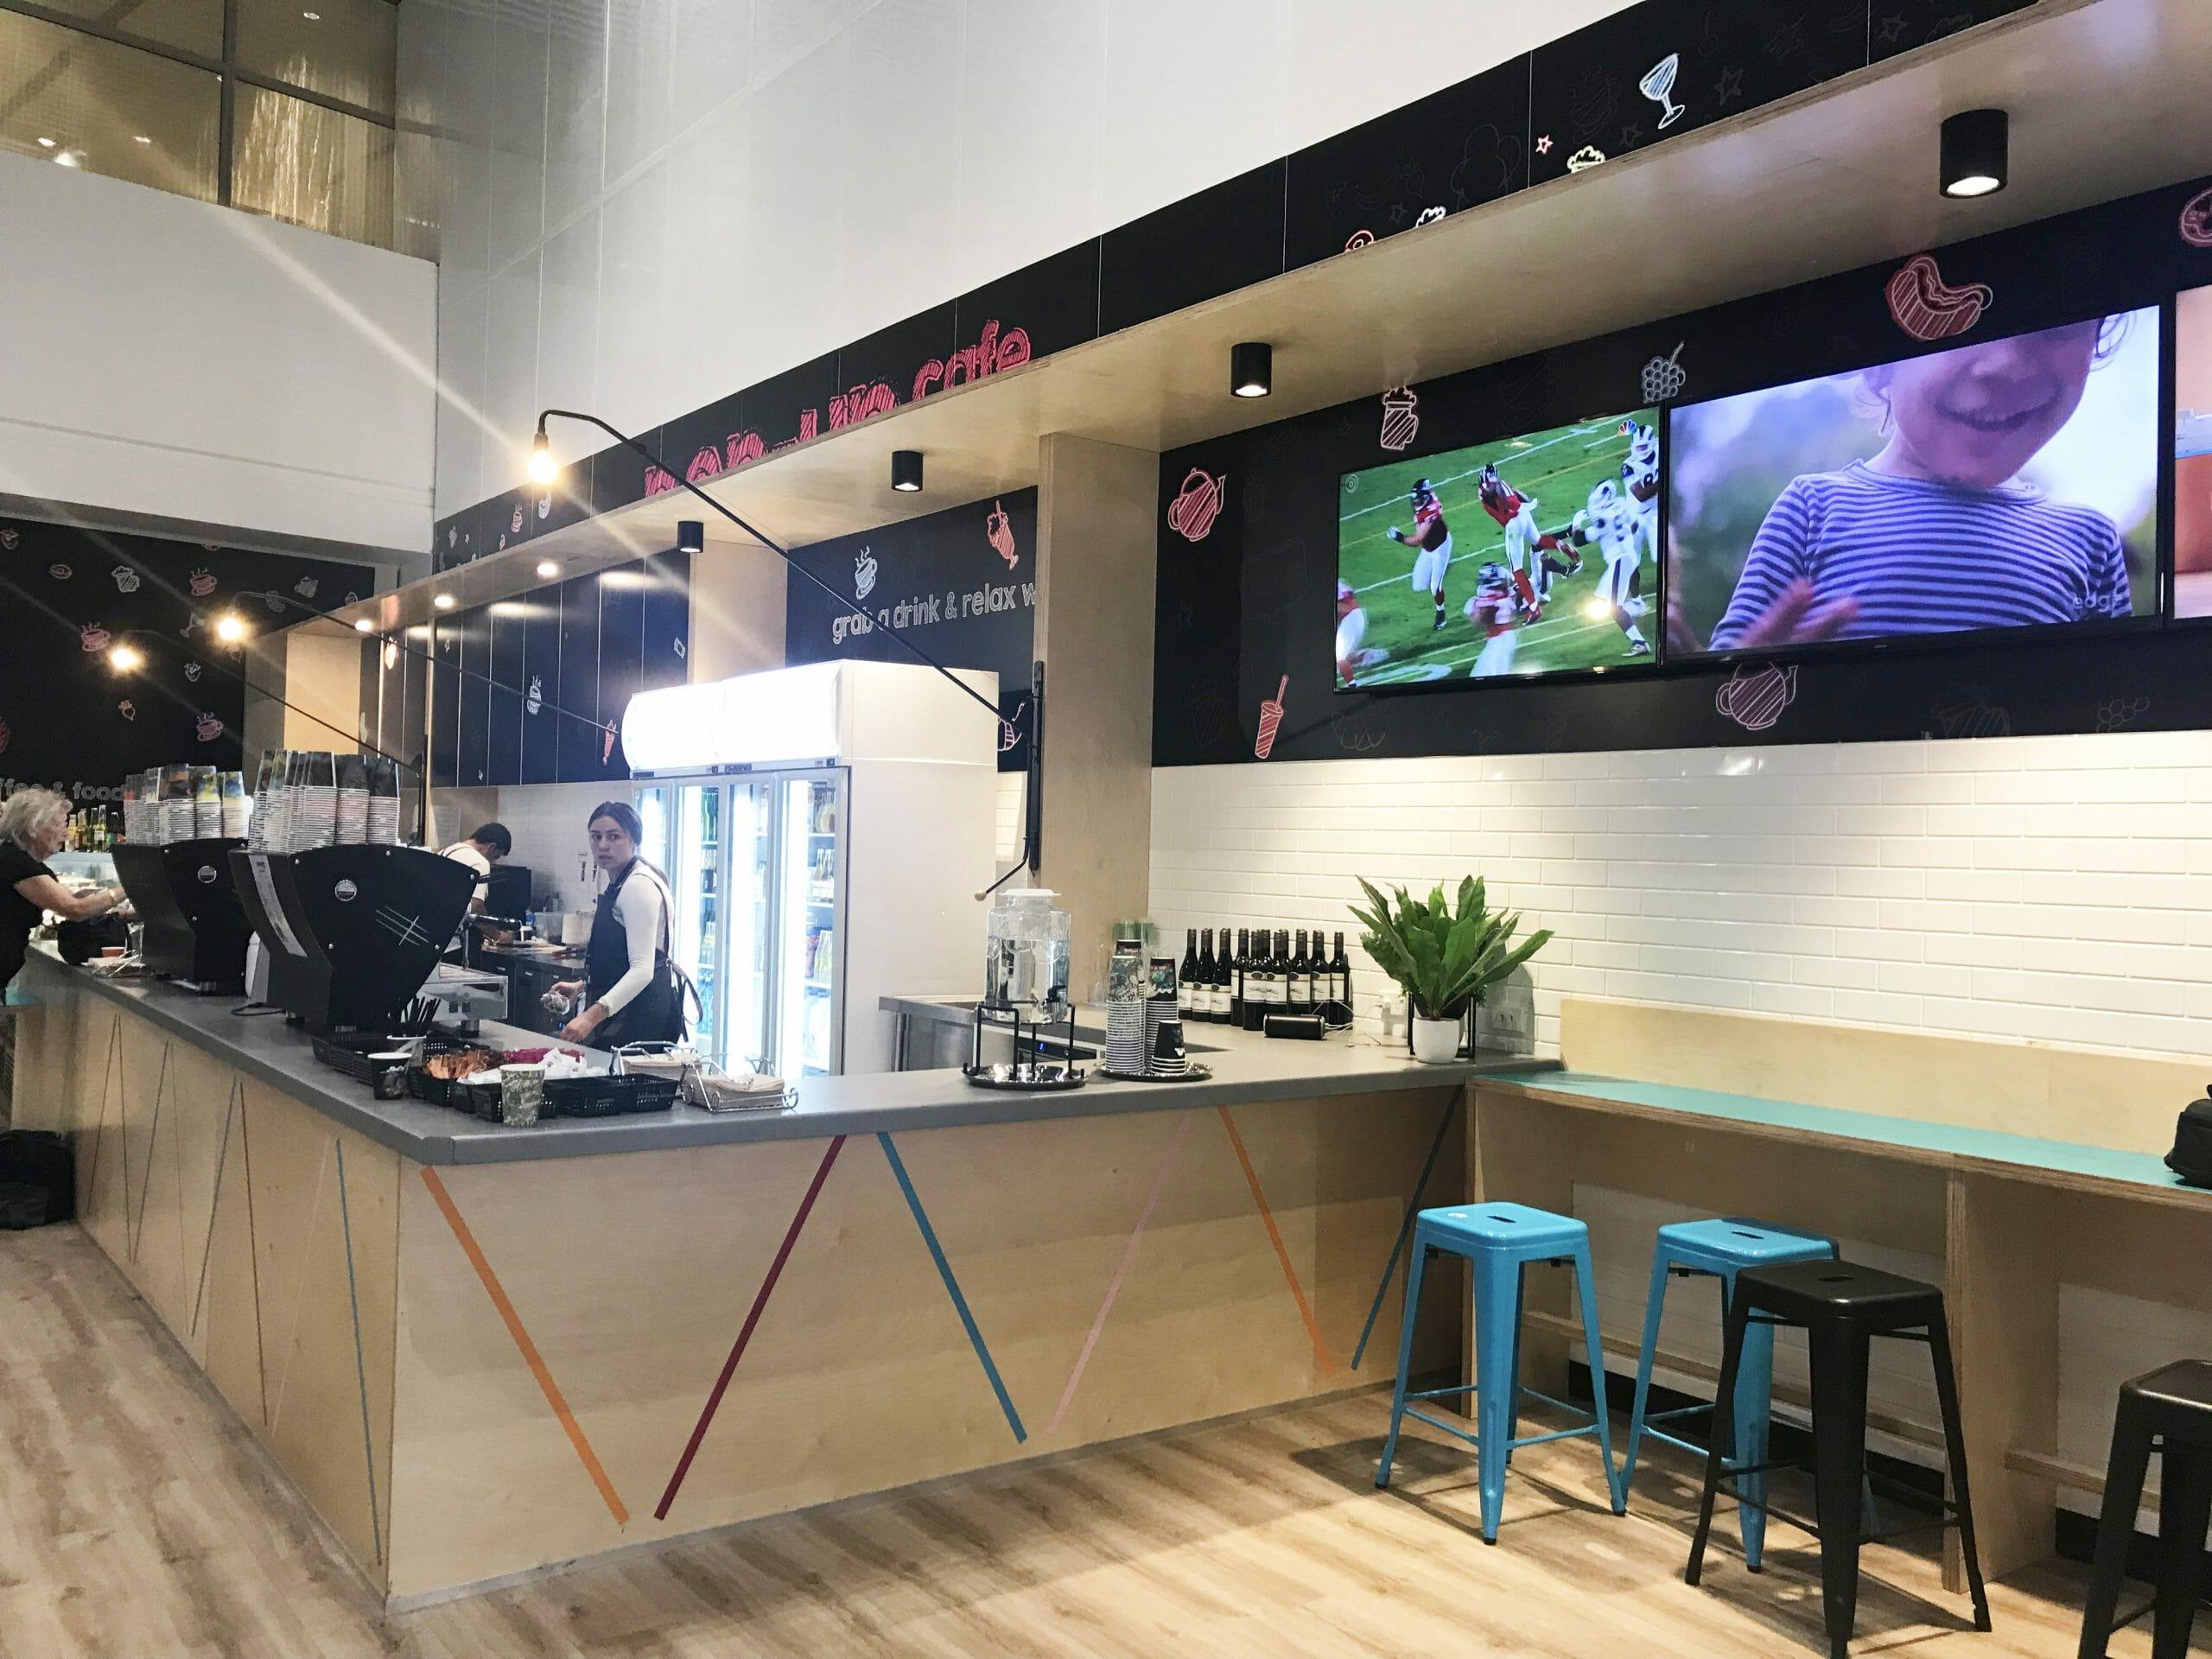 Pop-up Cafe